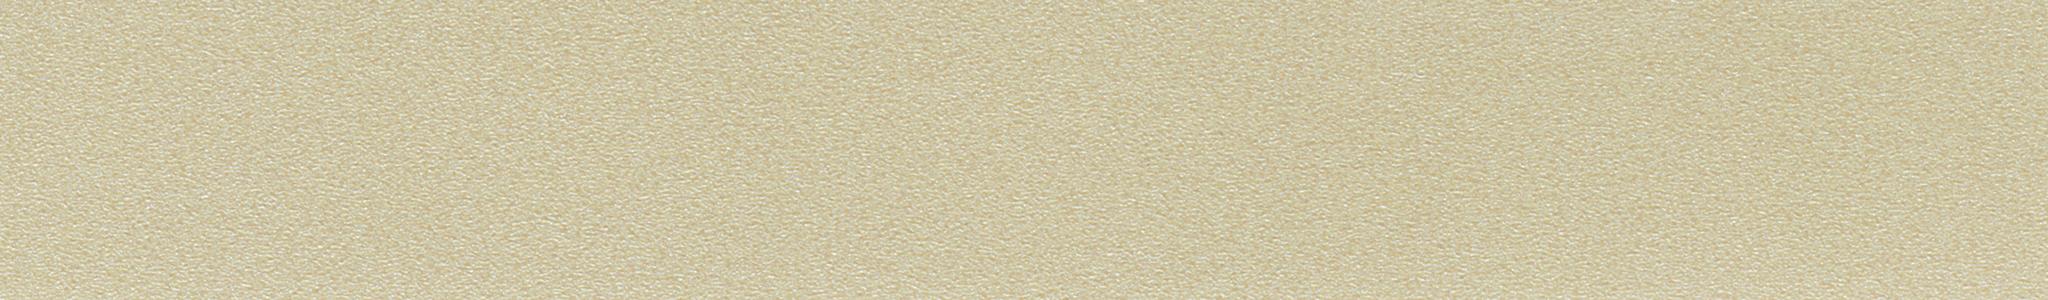 HD 29571 ABS hrana Gold Metalic perla